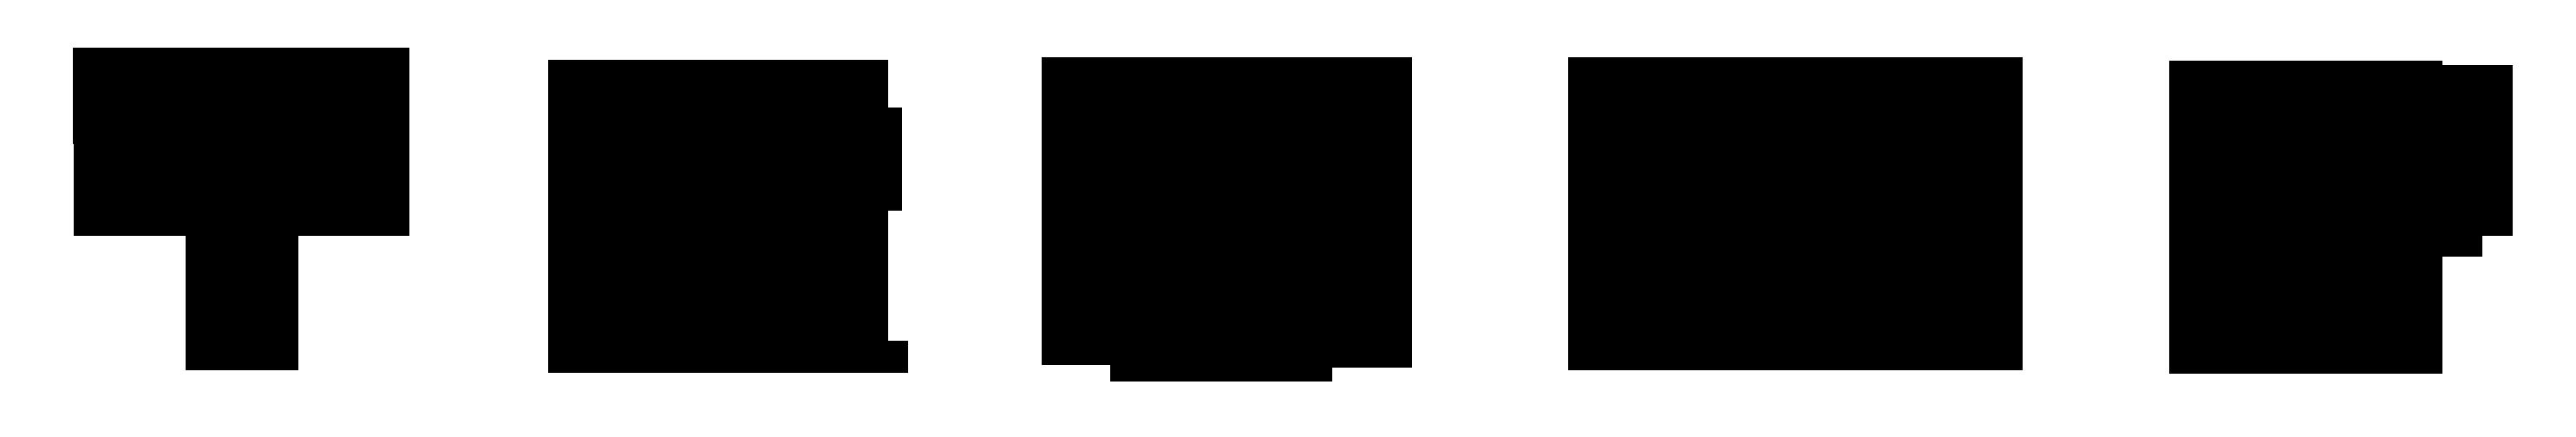 File:Trump Text Logo.png.